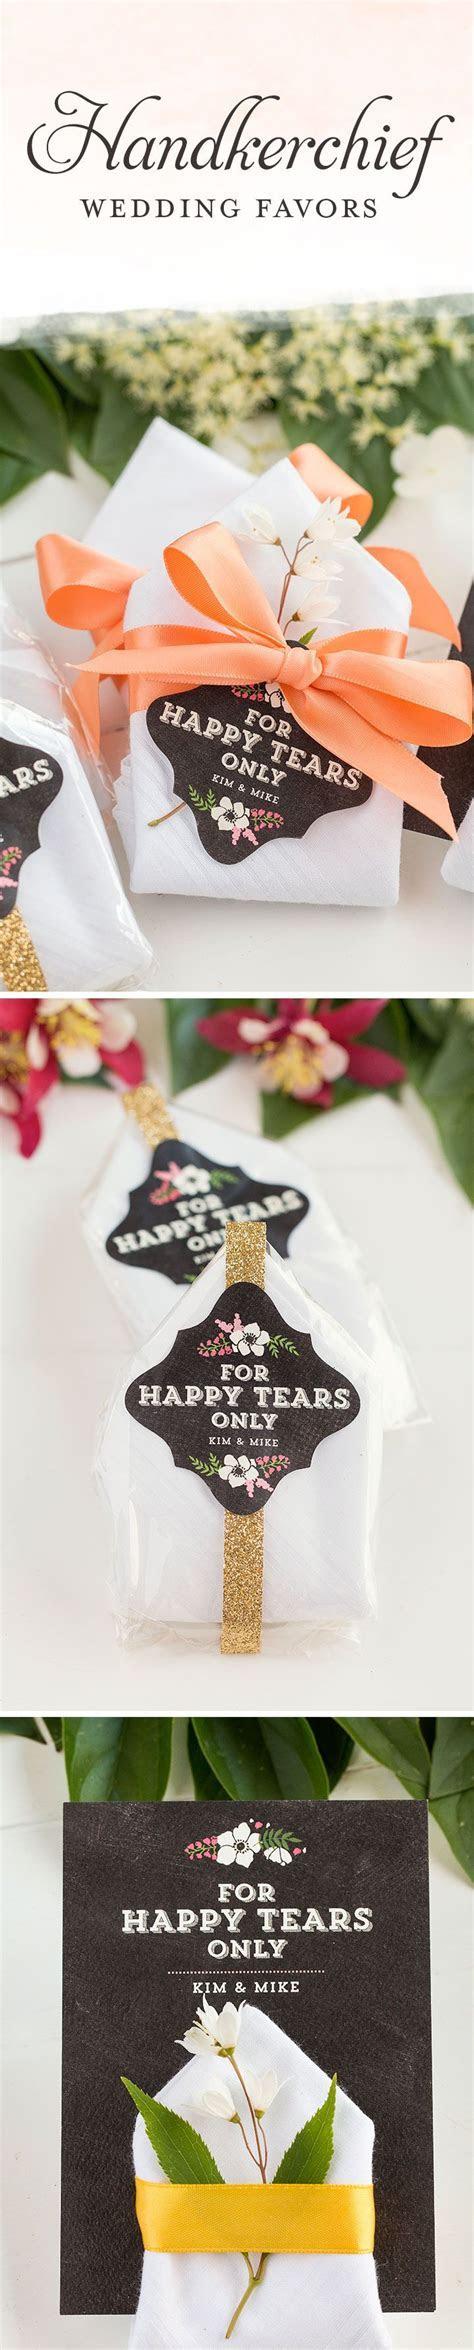 Handkerchief Wedding Favors   Wedding Favor Ideas